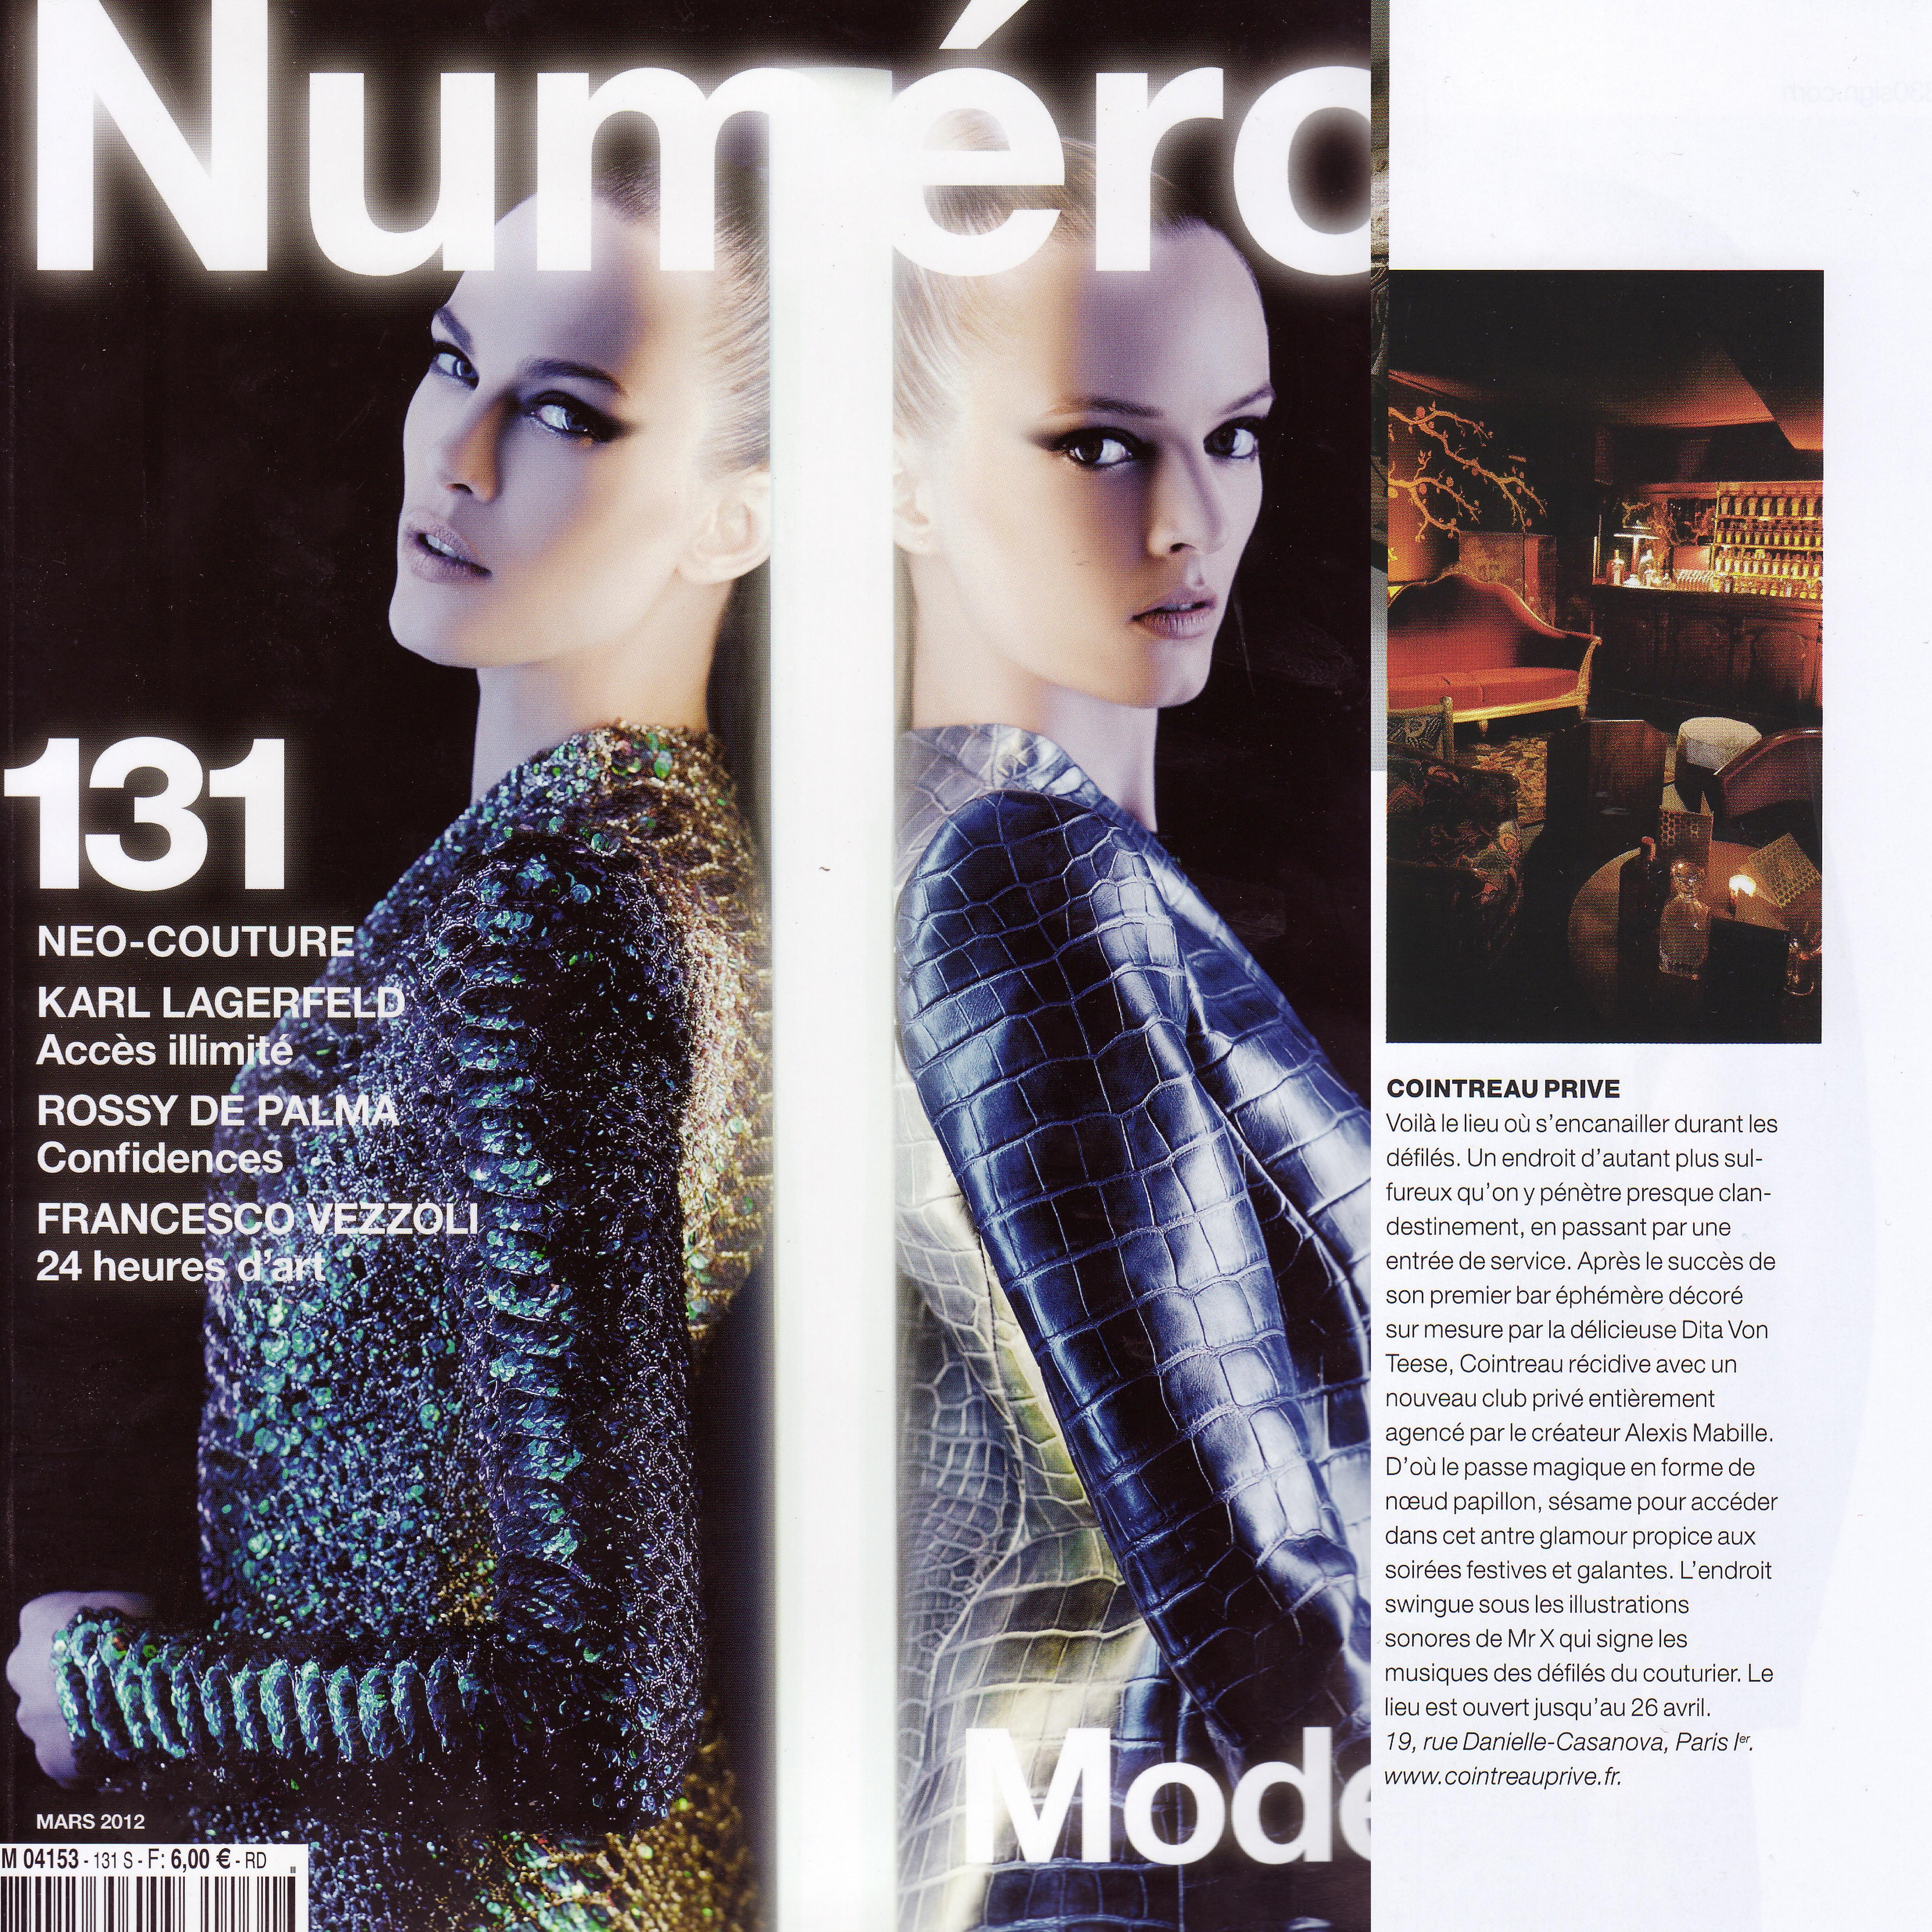 Numéro Mars 2012